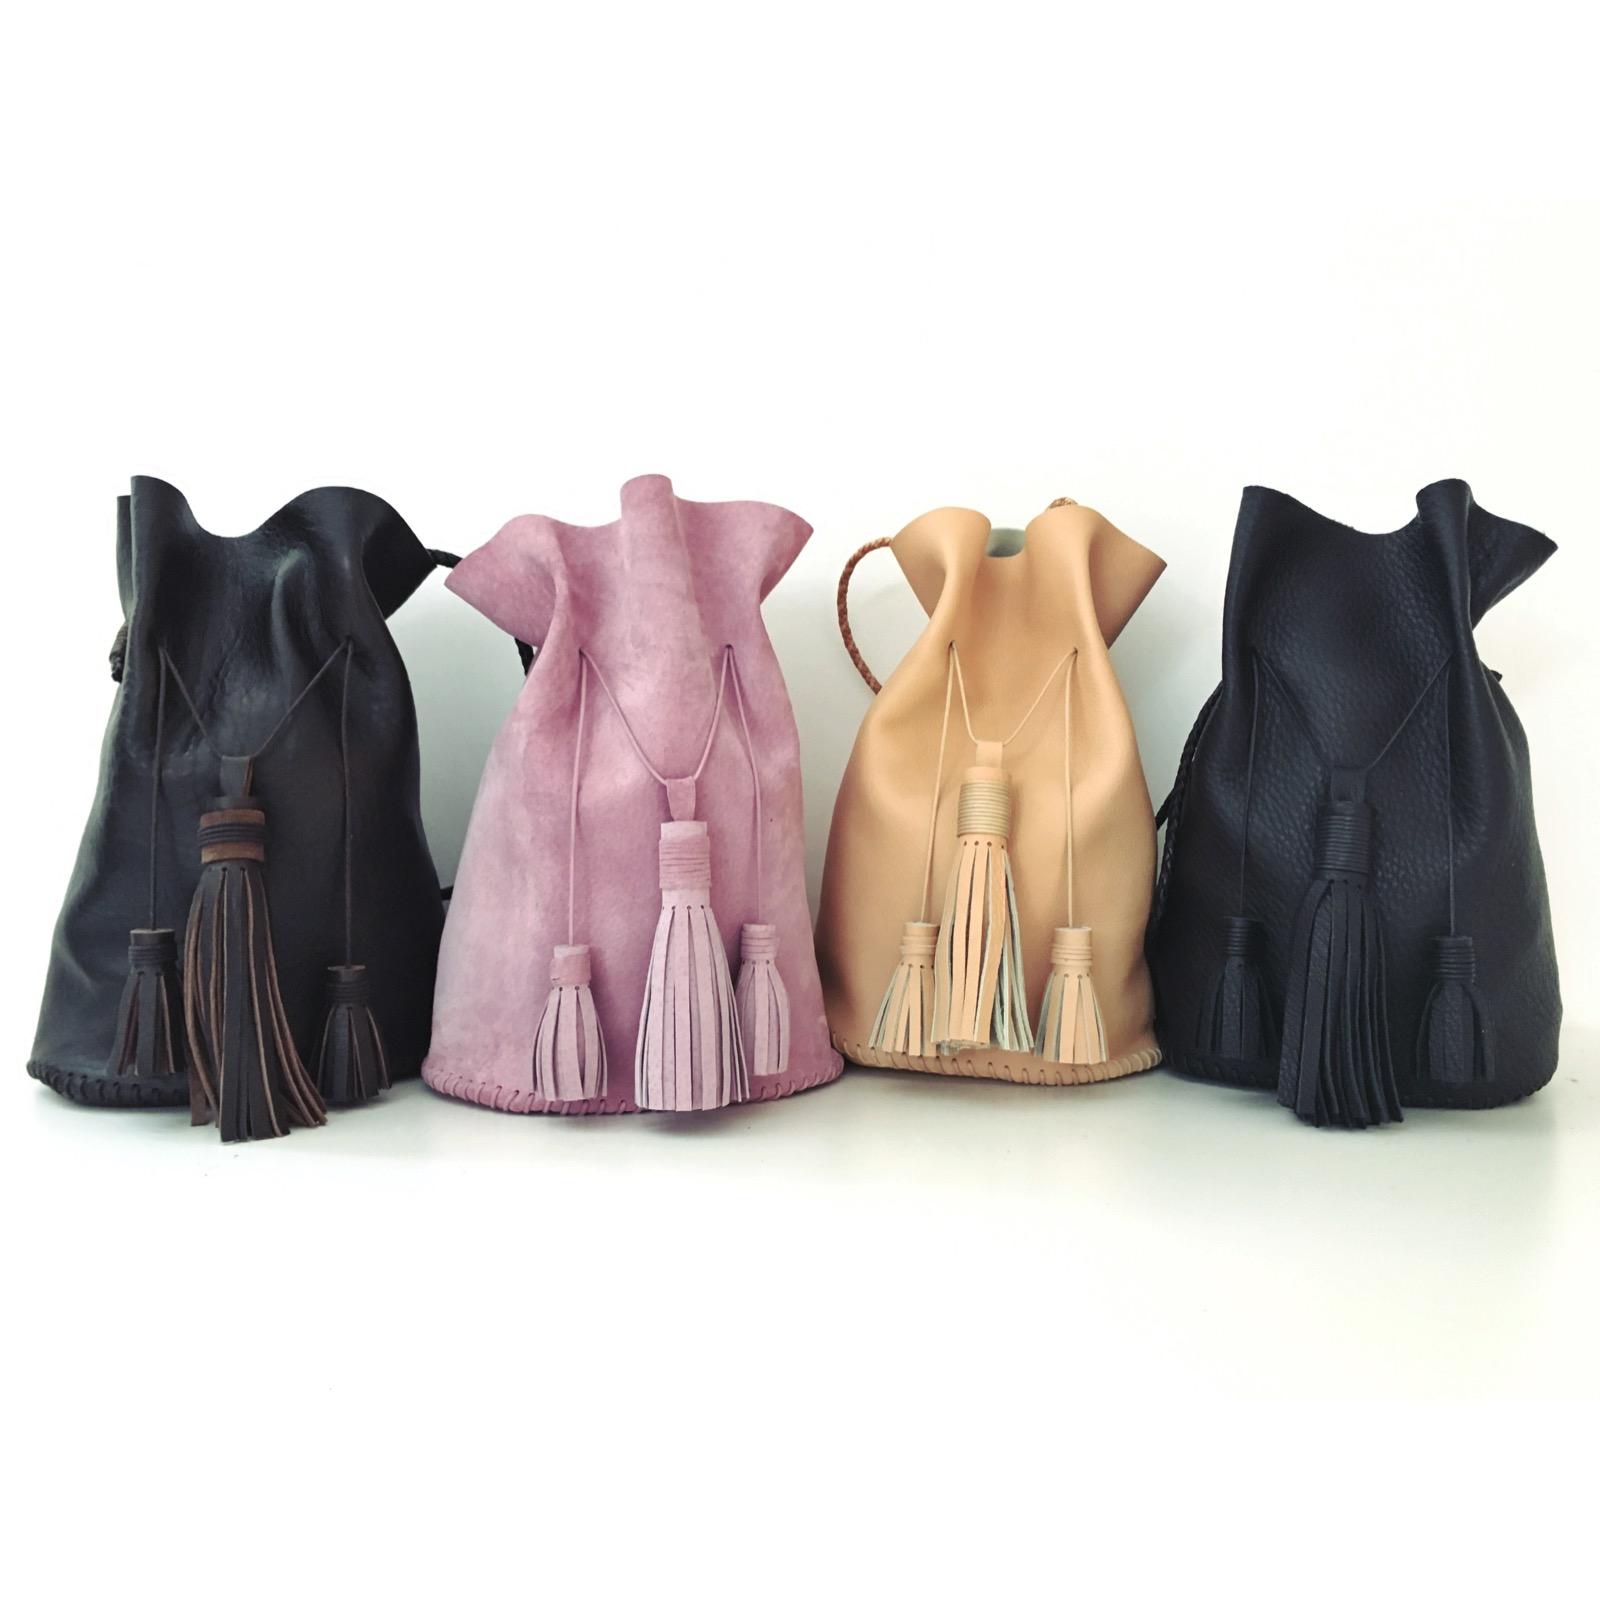 AIDA LEATHER BUCKET BAG  WHOLESALE $275  SRP $375